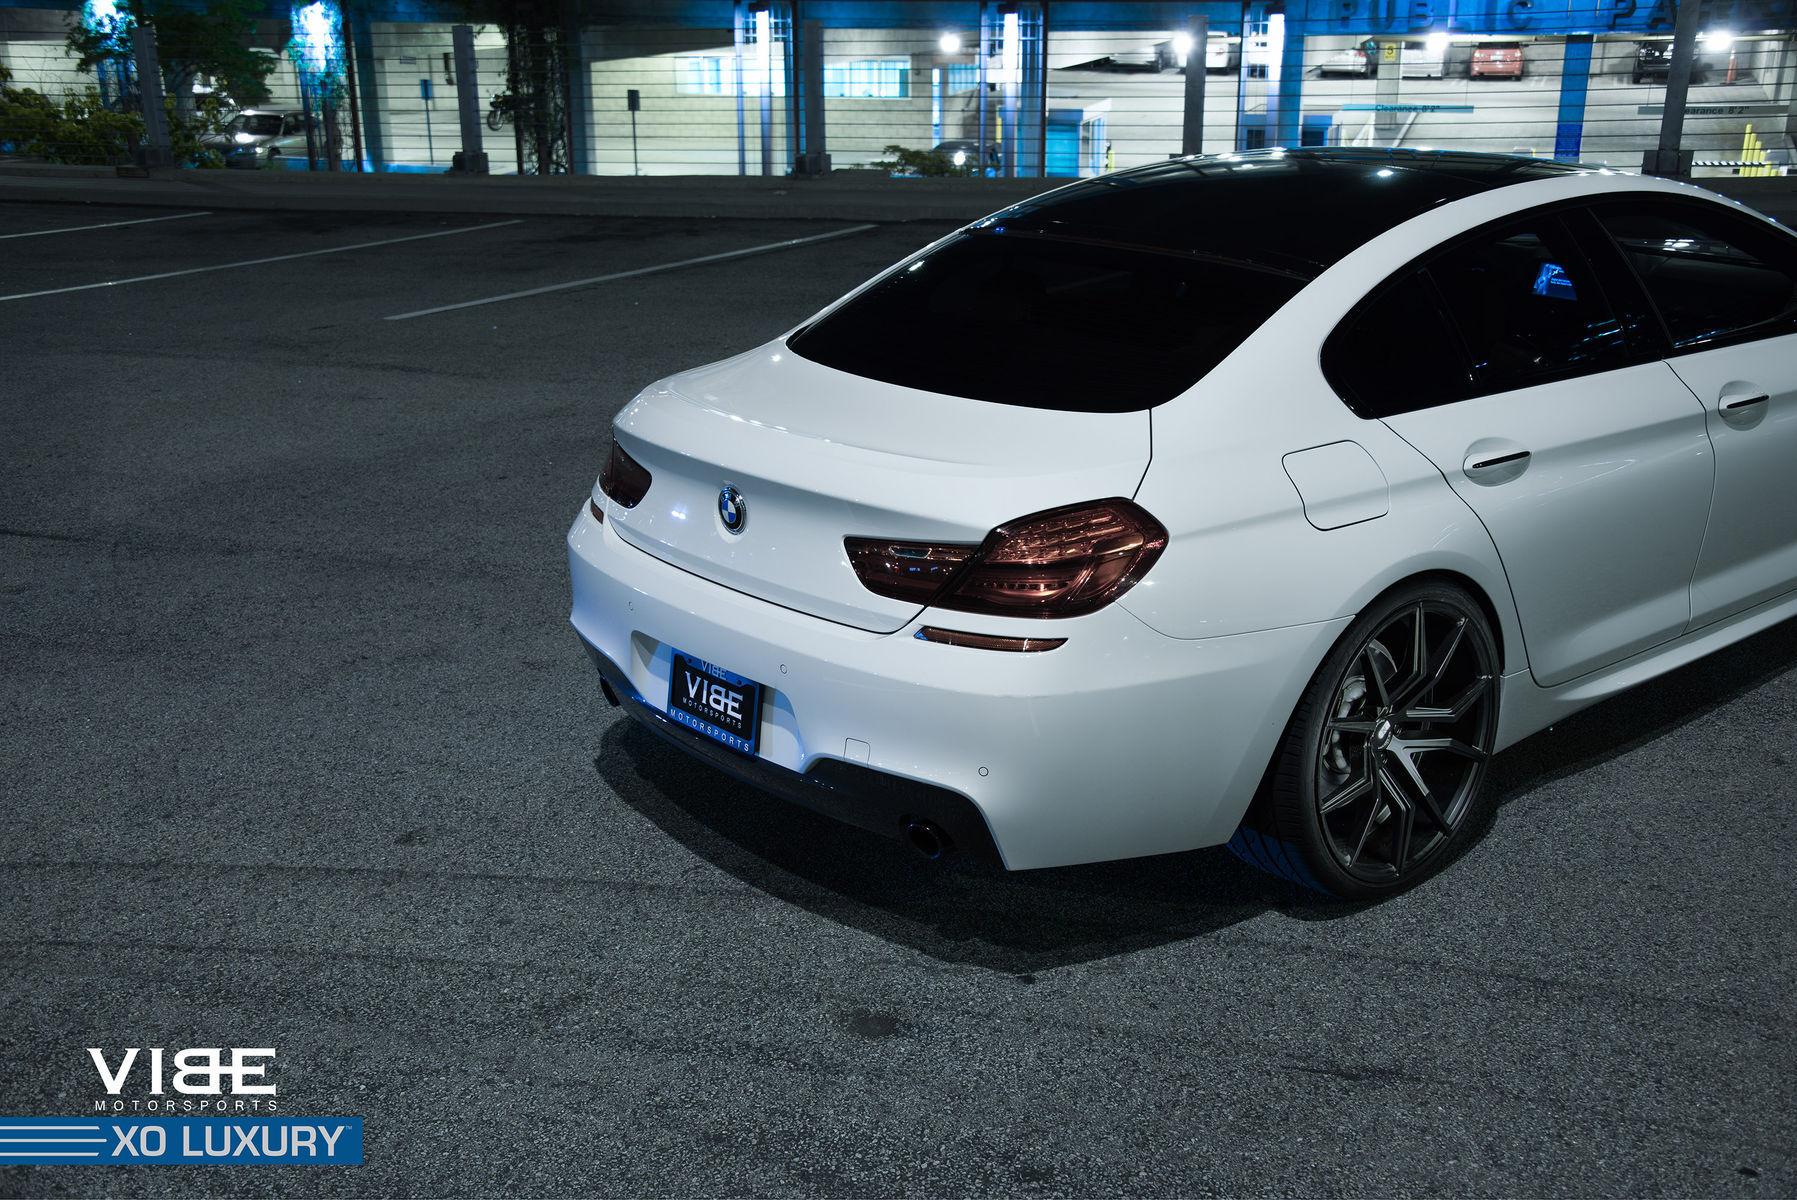 2014 BMW 6 Series Gran Coupe   '14 BMW 650li on 22's - XO Luxury